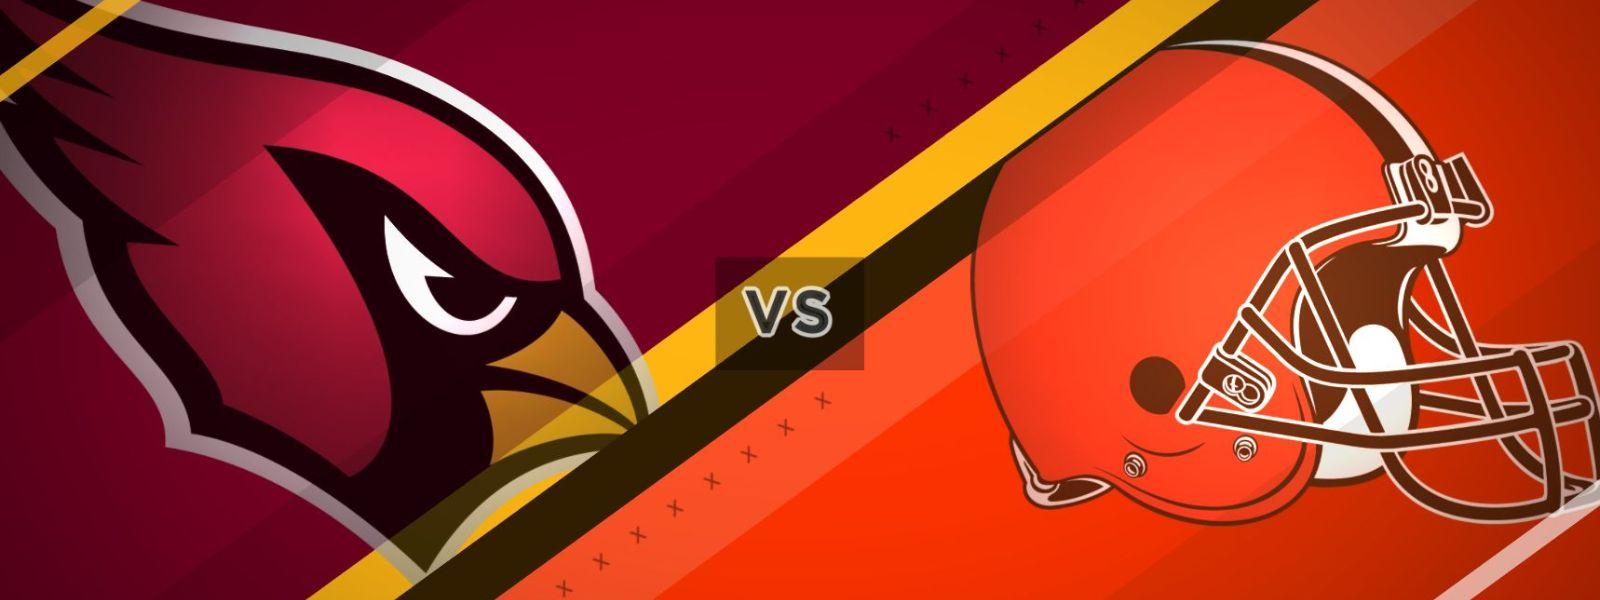 Browns vs. Cardinals